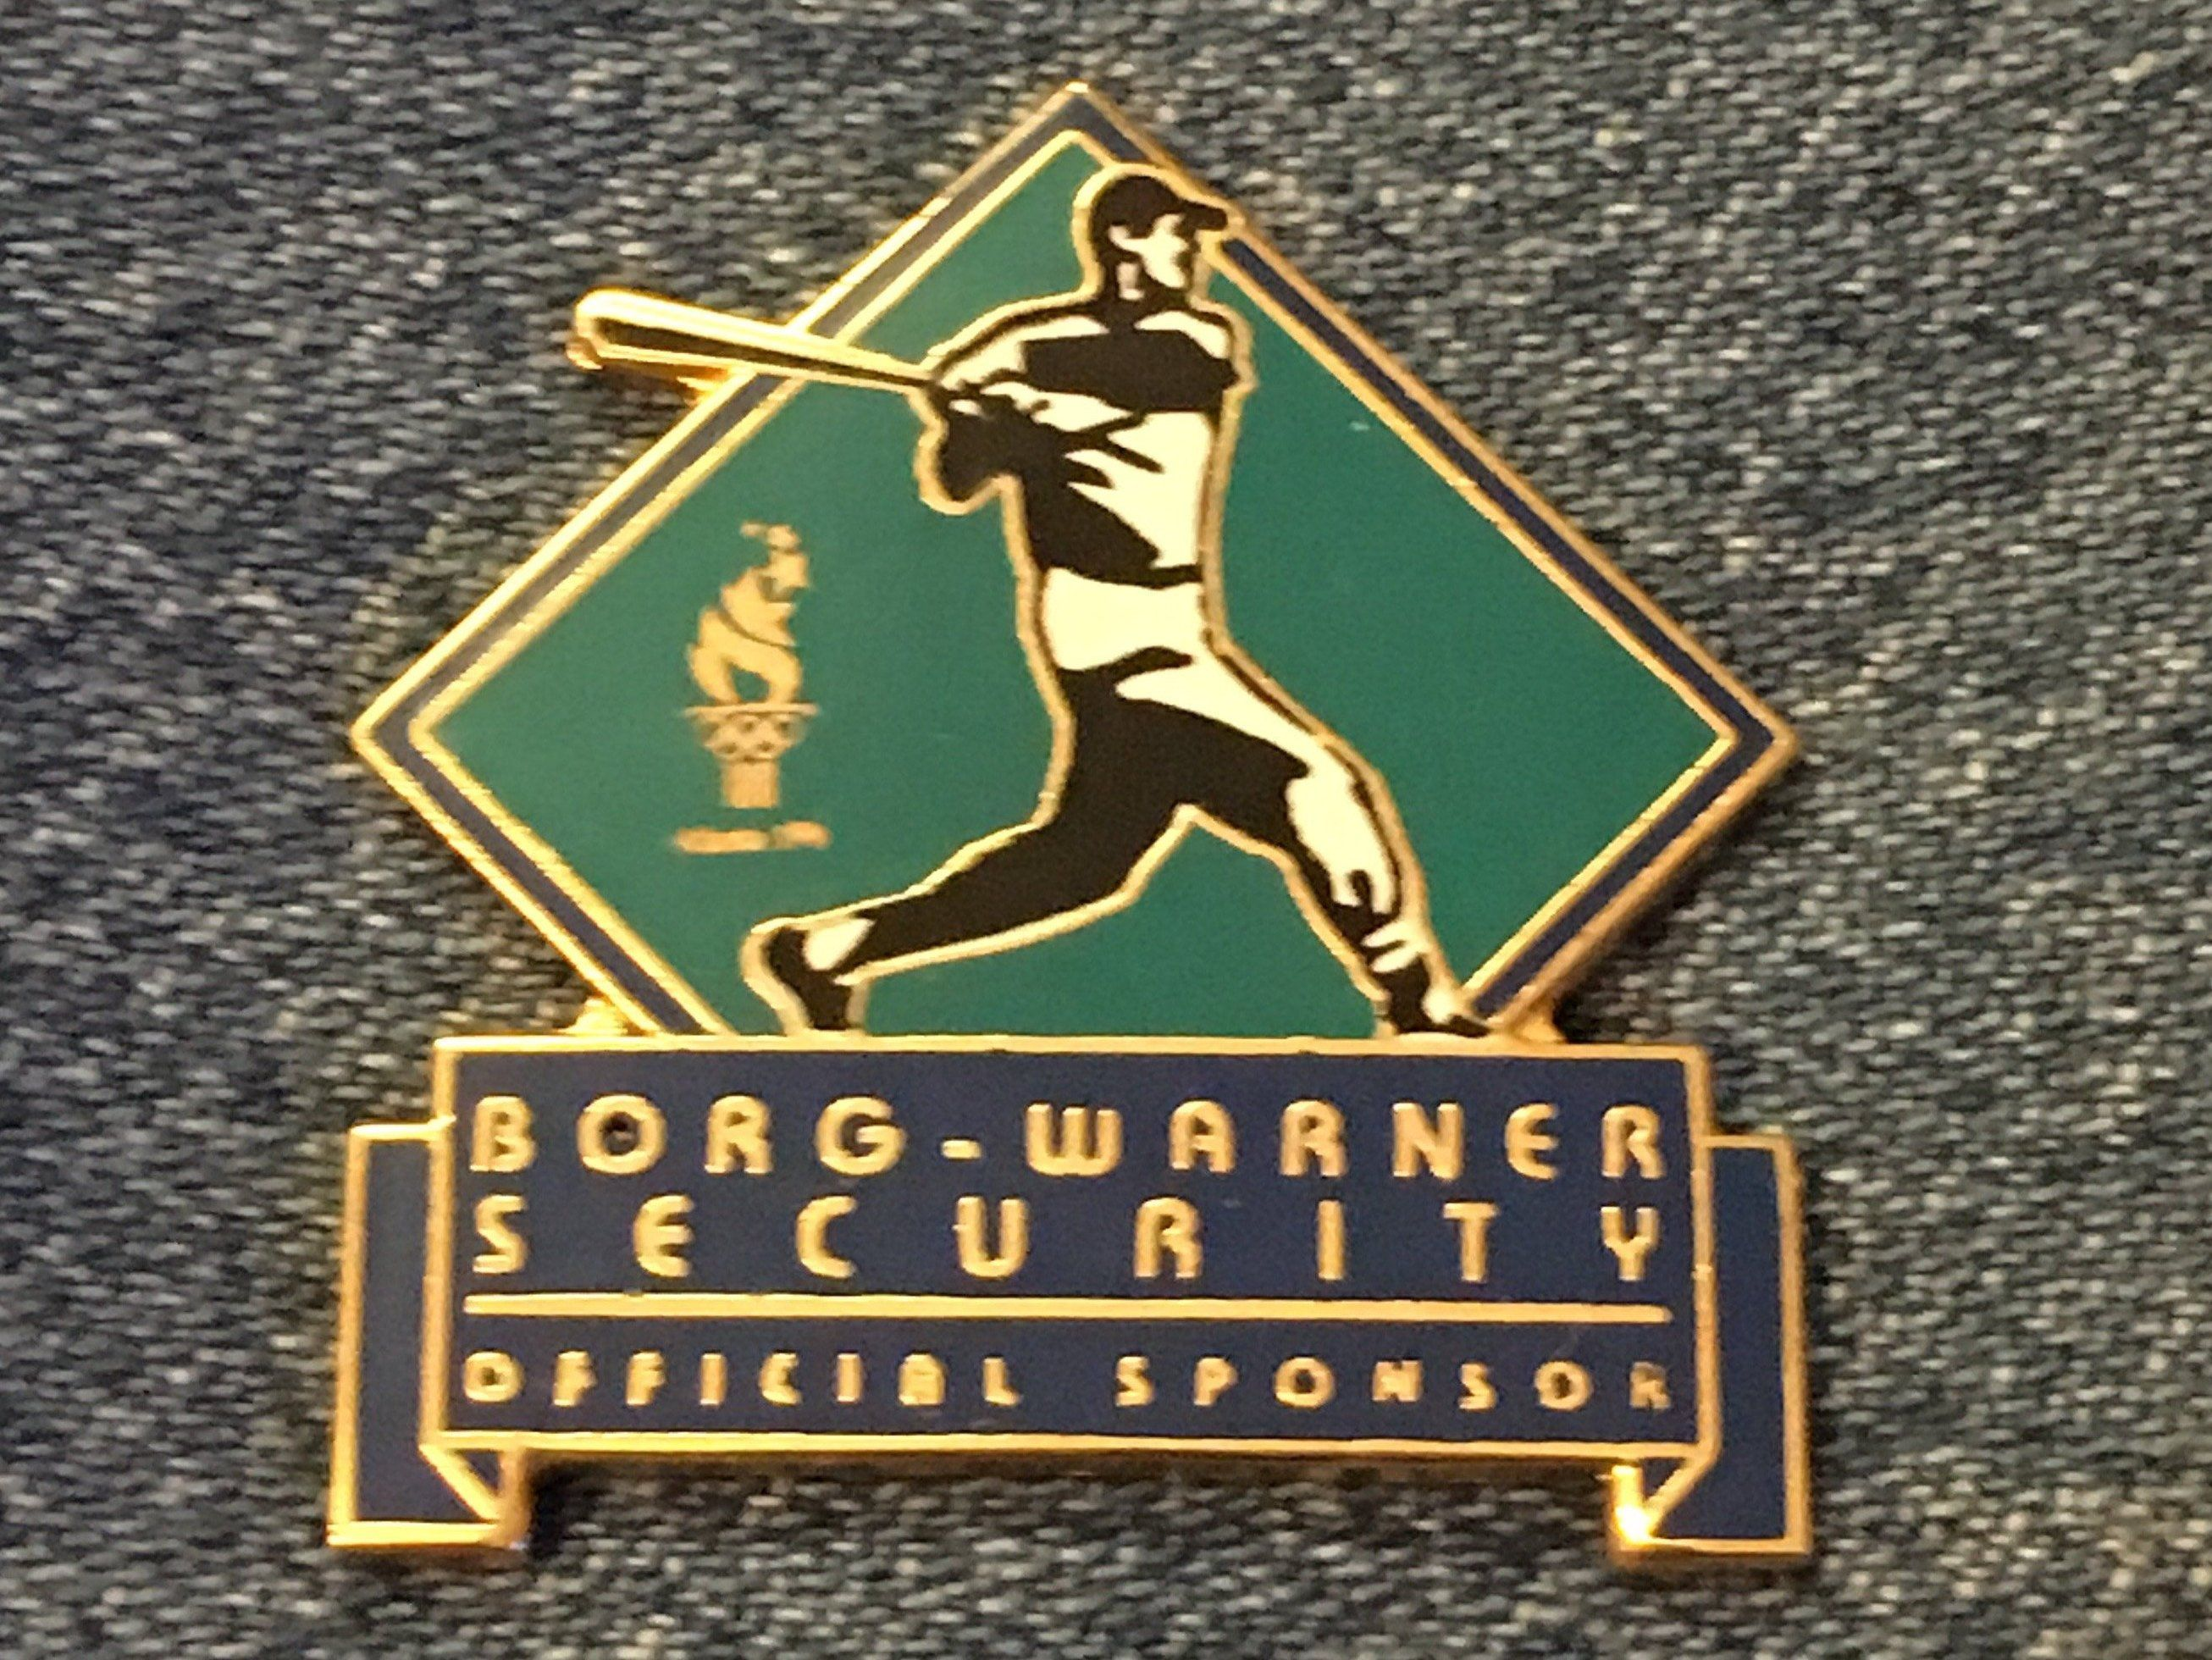 Baseball Olympic Pin 1996 Atlanta Summer Games Sponsor